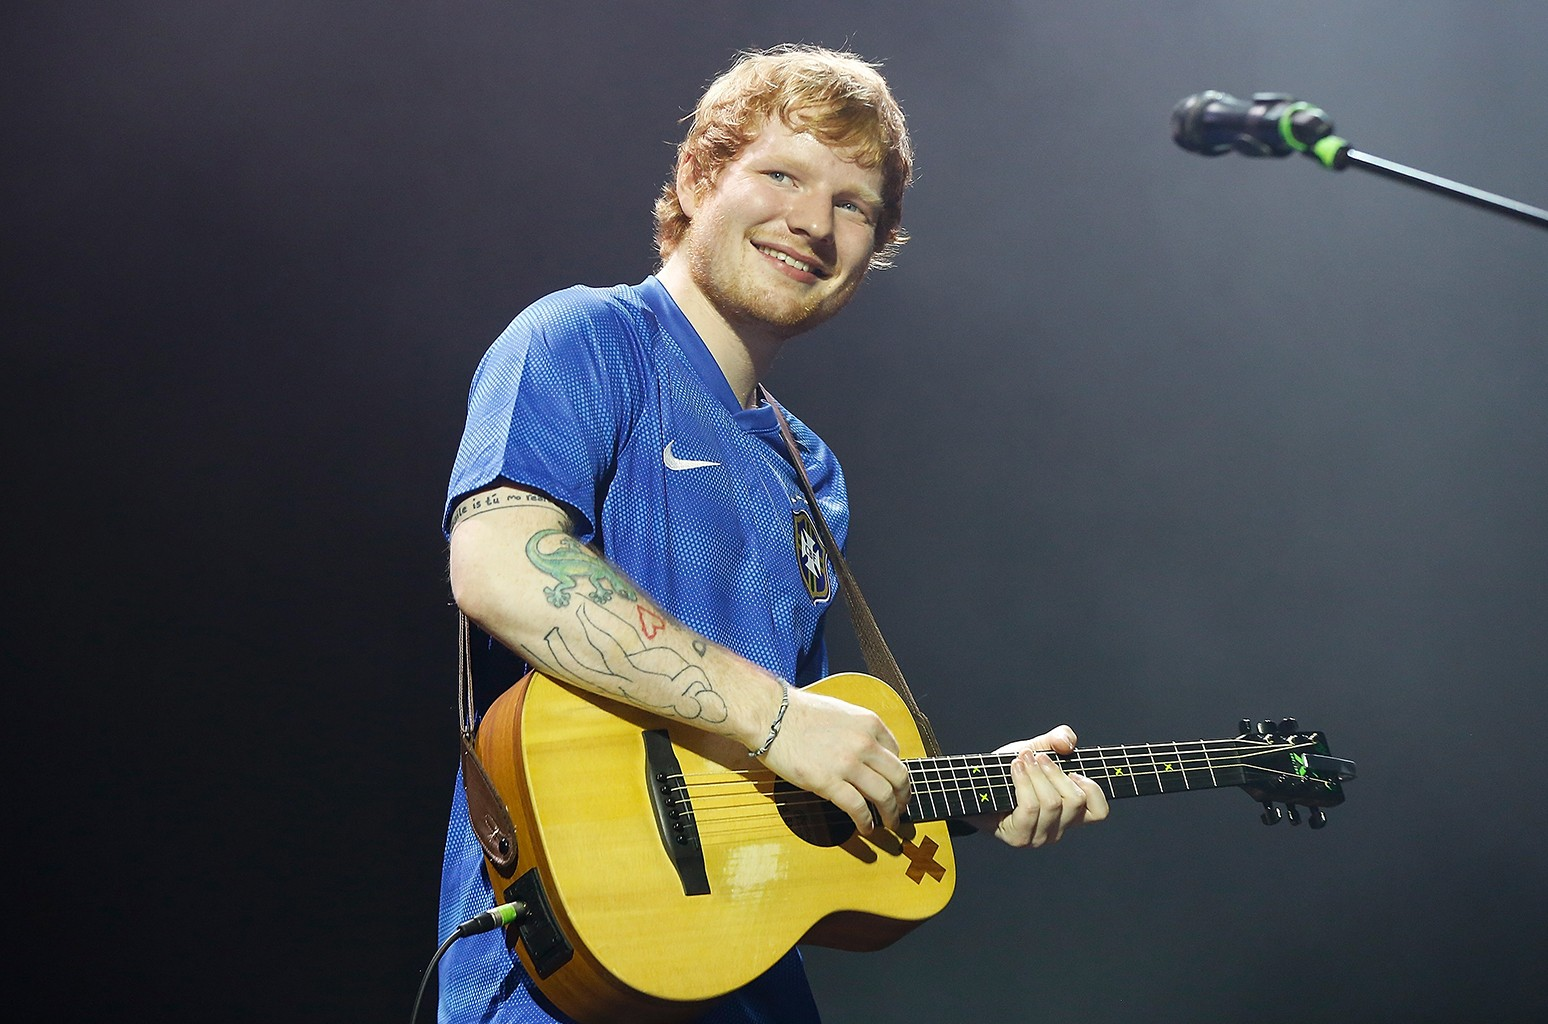 Ed Sheeran perfoms at Espaco das Americas on April 29, 2015 in Sao Paulo, Brazil.